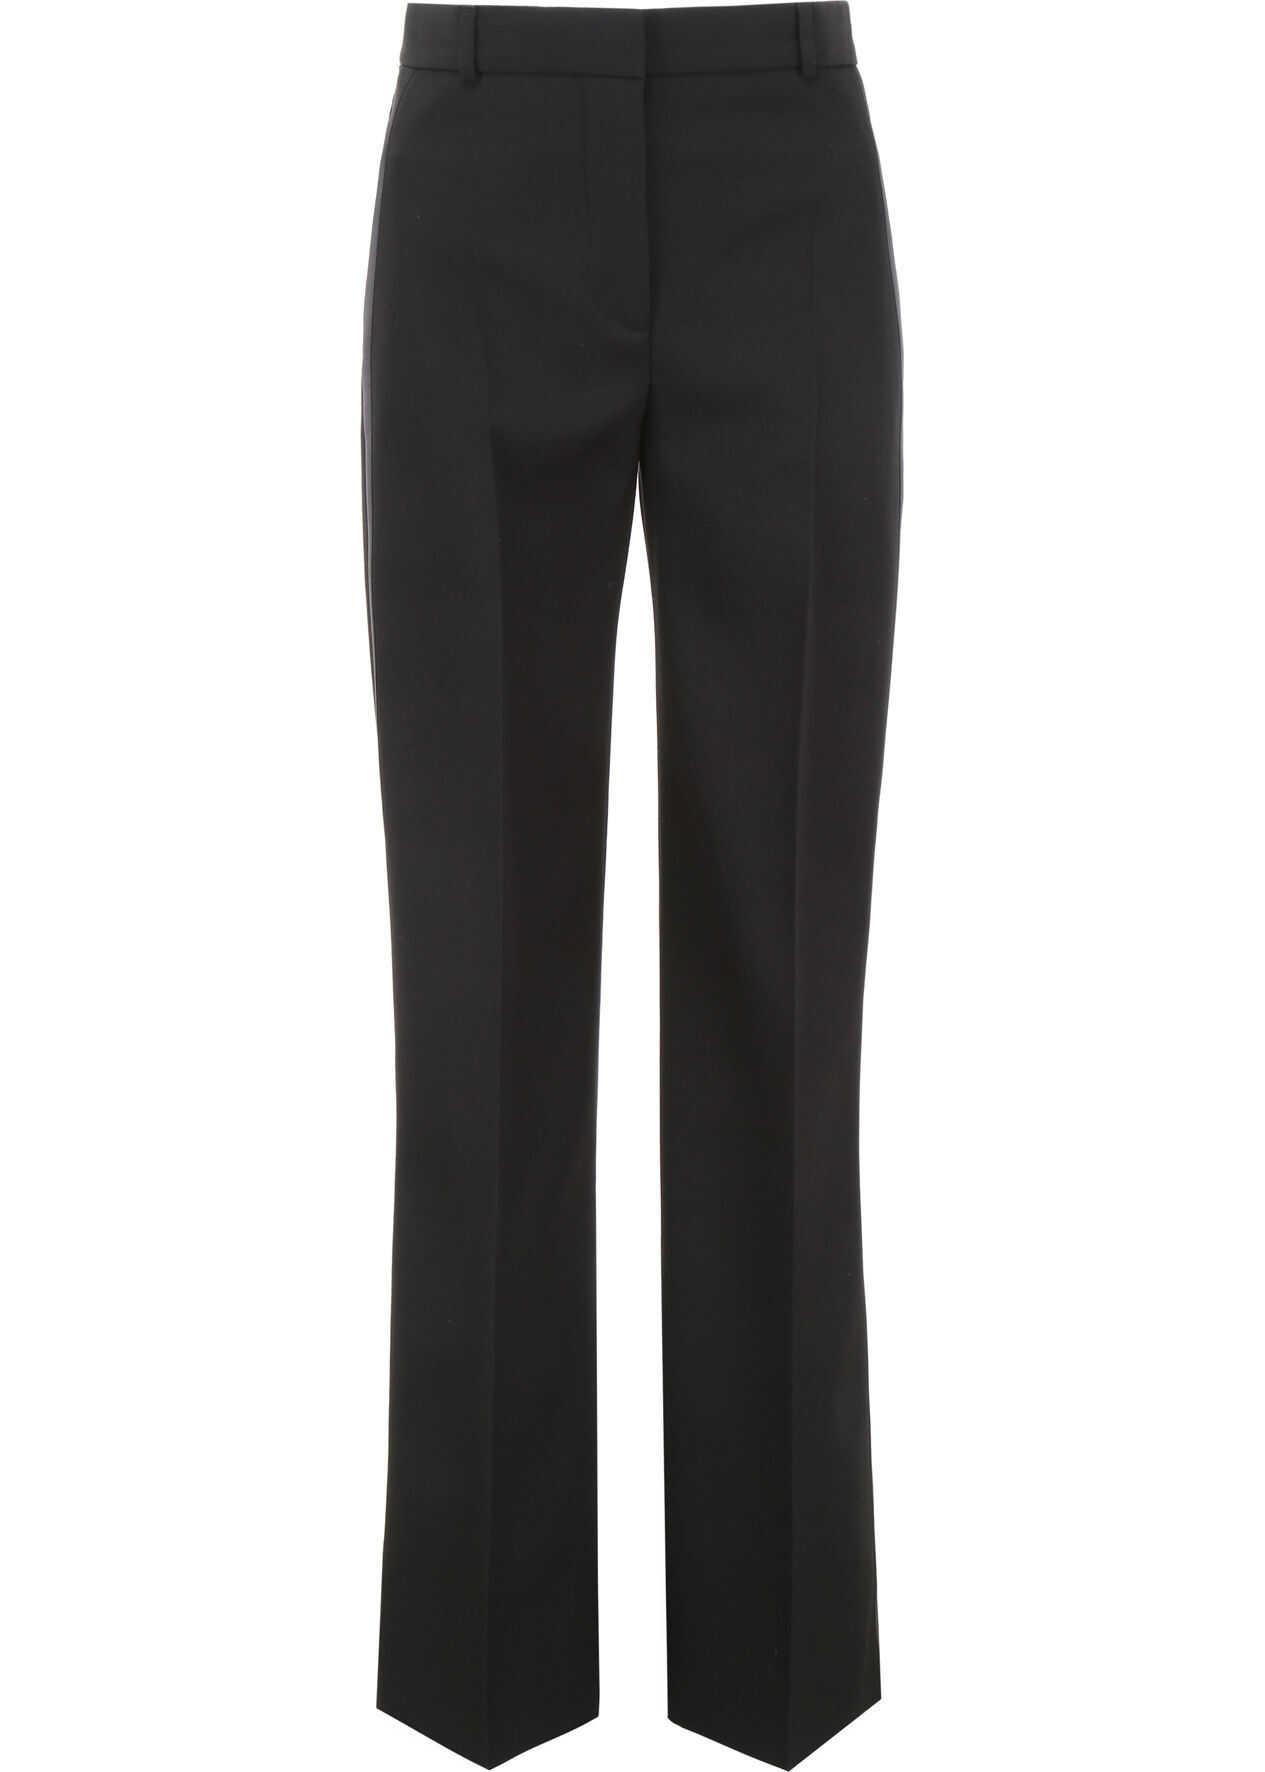 Burberry Stonewood Trousers BLACK